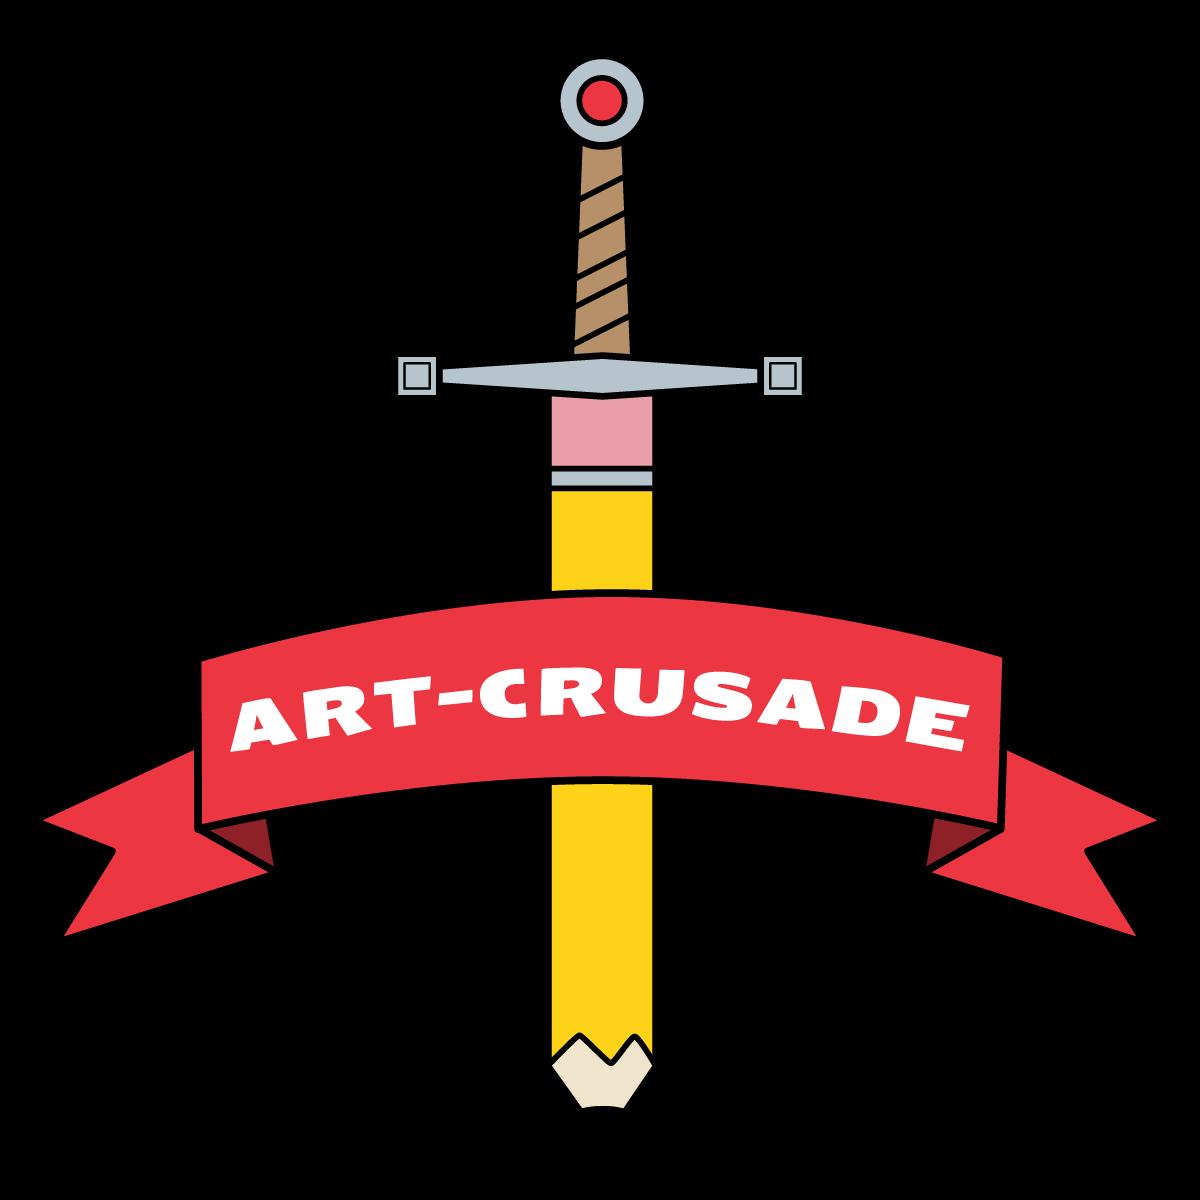 The Art Crusade